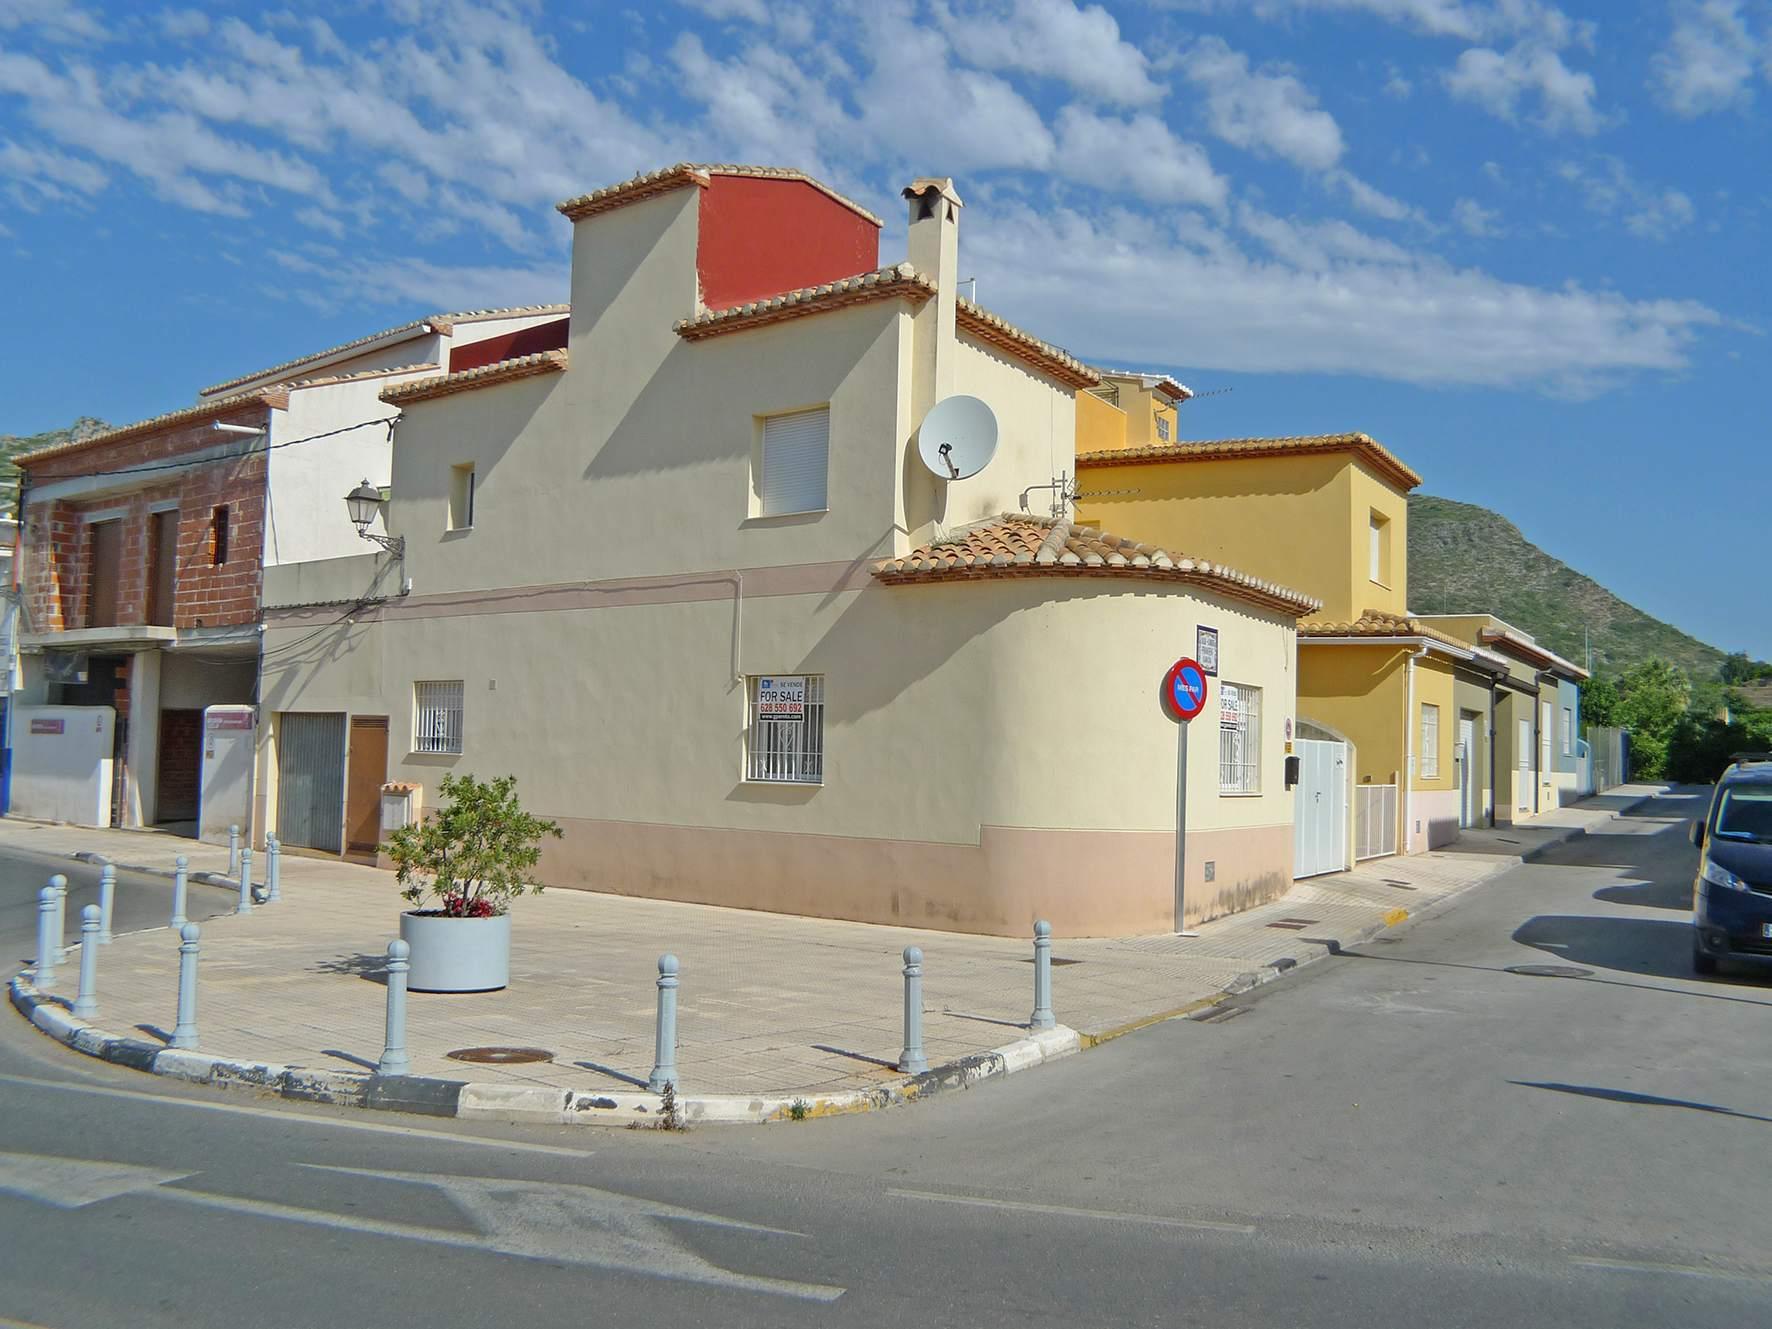 Village house in Rafol de almunia